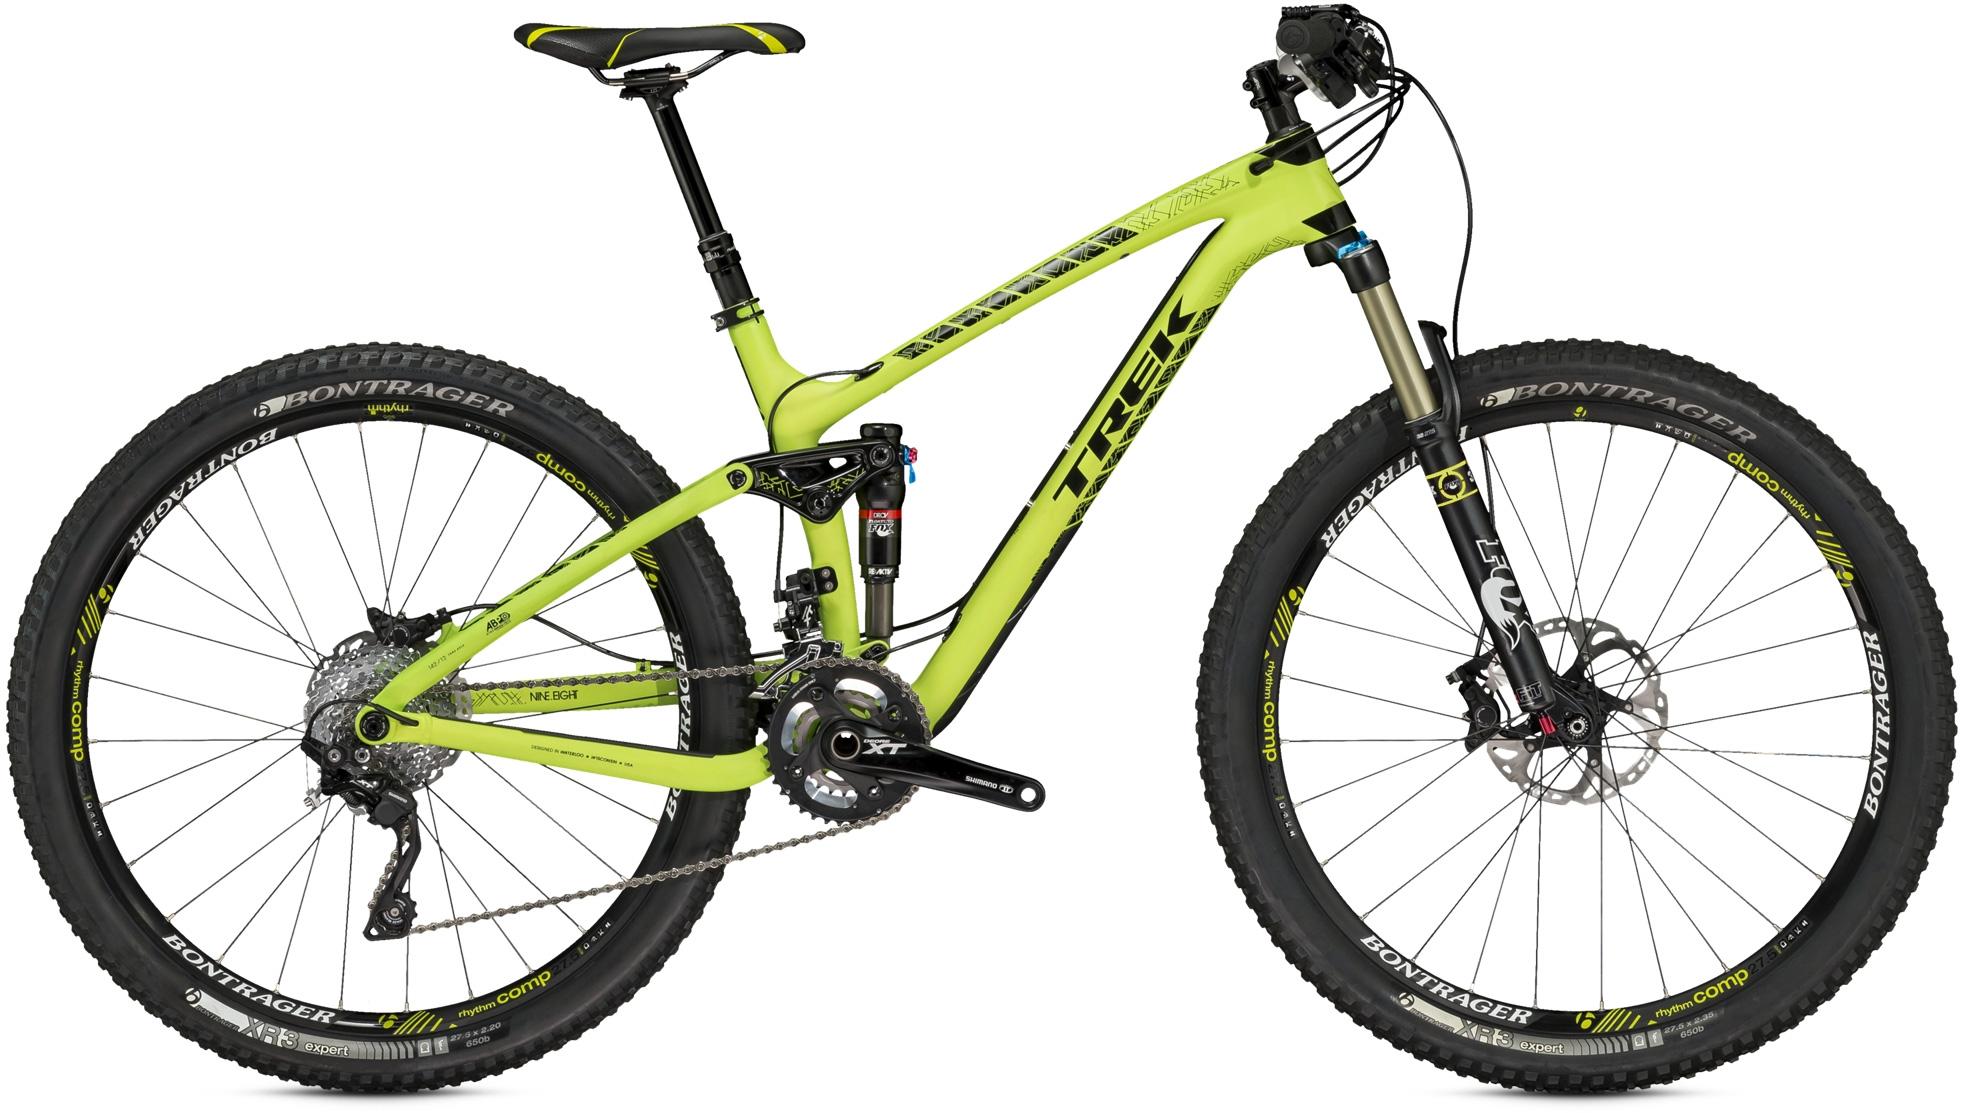 8e1b66377a8 Trek Fuel EX 9.8 27.5 - Planet Bike East Brunswick Matawan / Old Bridge